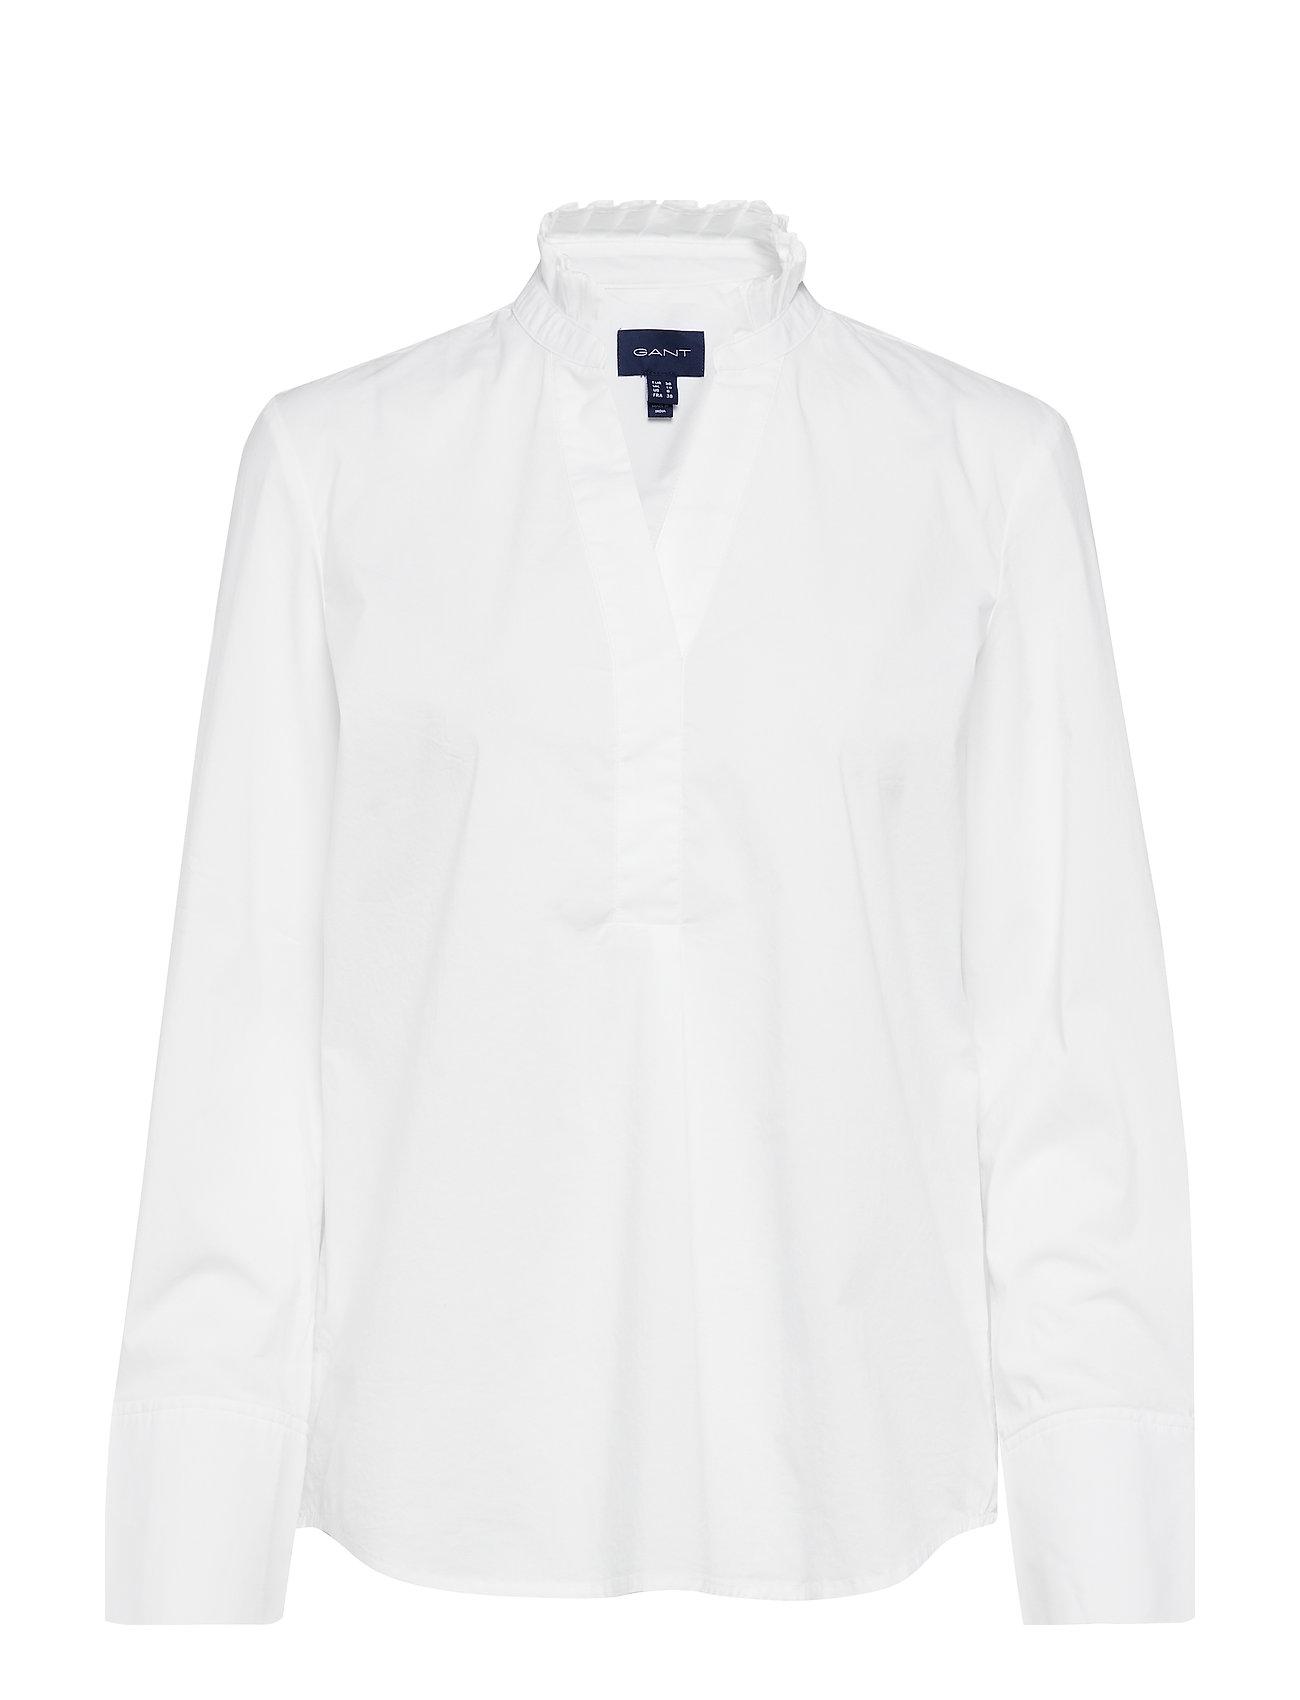 17c26912 D1. Tp Frill Shirt (White) (99.99 €) - GANT - | Boozt.com